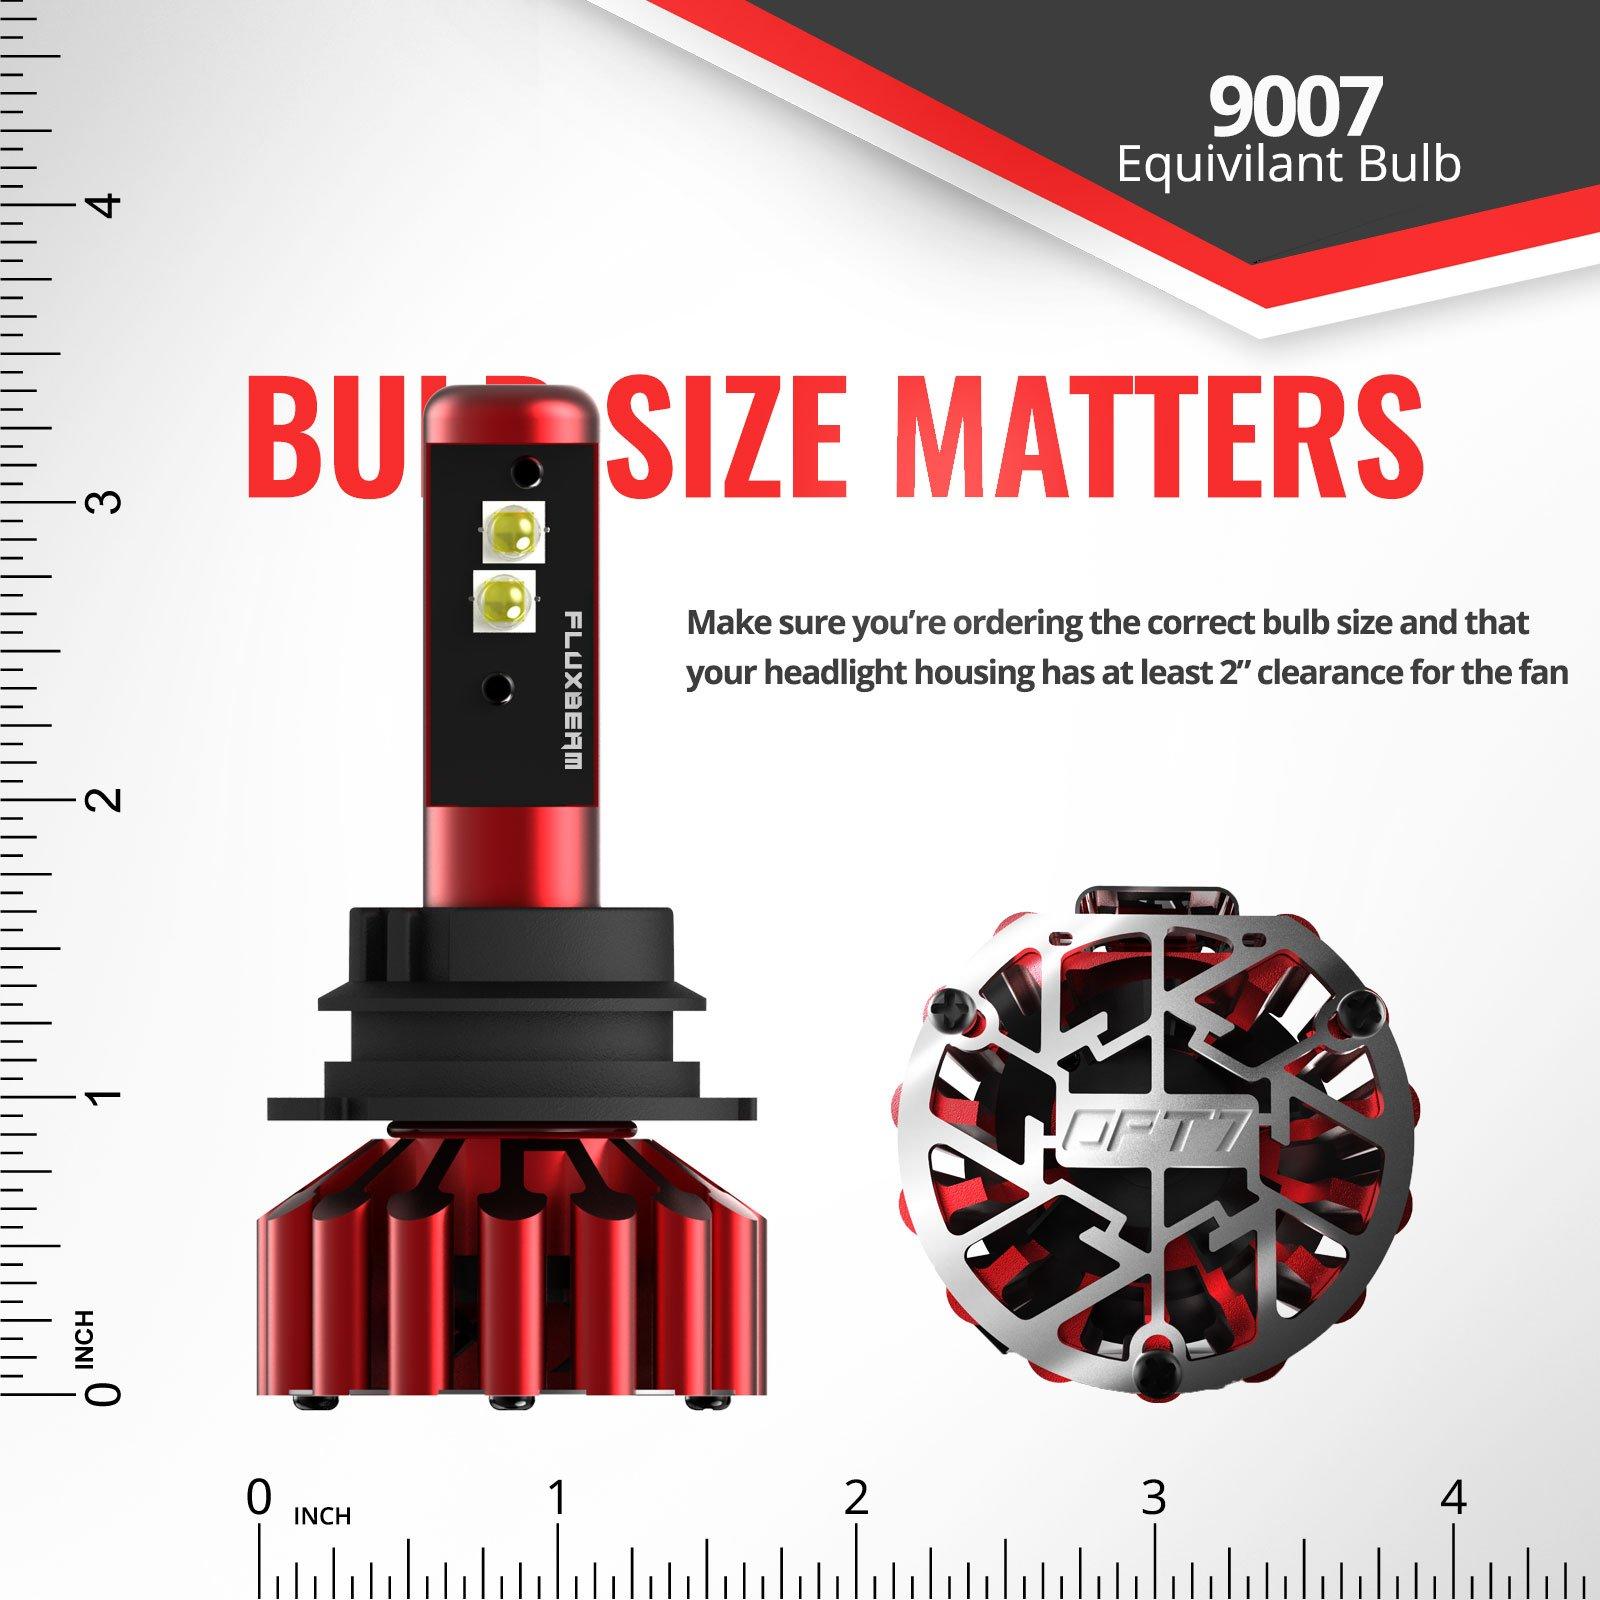 OPT7 Fluxbeam X 9007 LED Headlight Bulbs w/Arc-Beam Lens - 8,400LM 6000K Daytime White - All Bulb Sizes - 80w - 2 Year Warranty by OPT7 (Image #9)